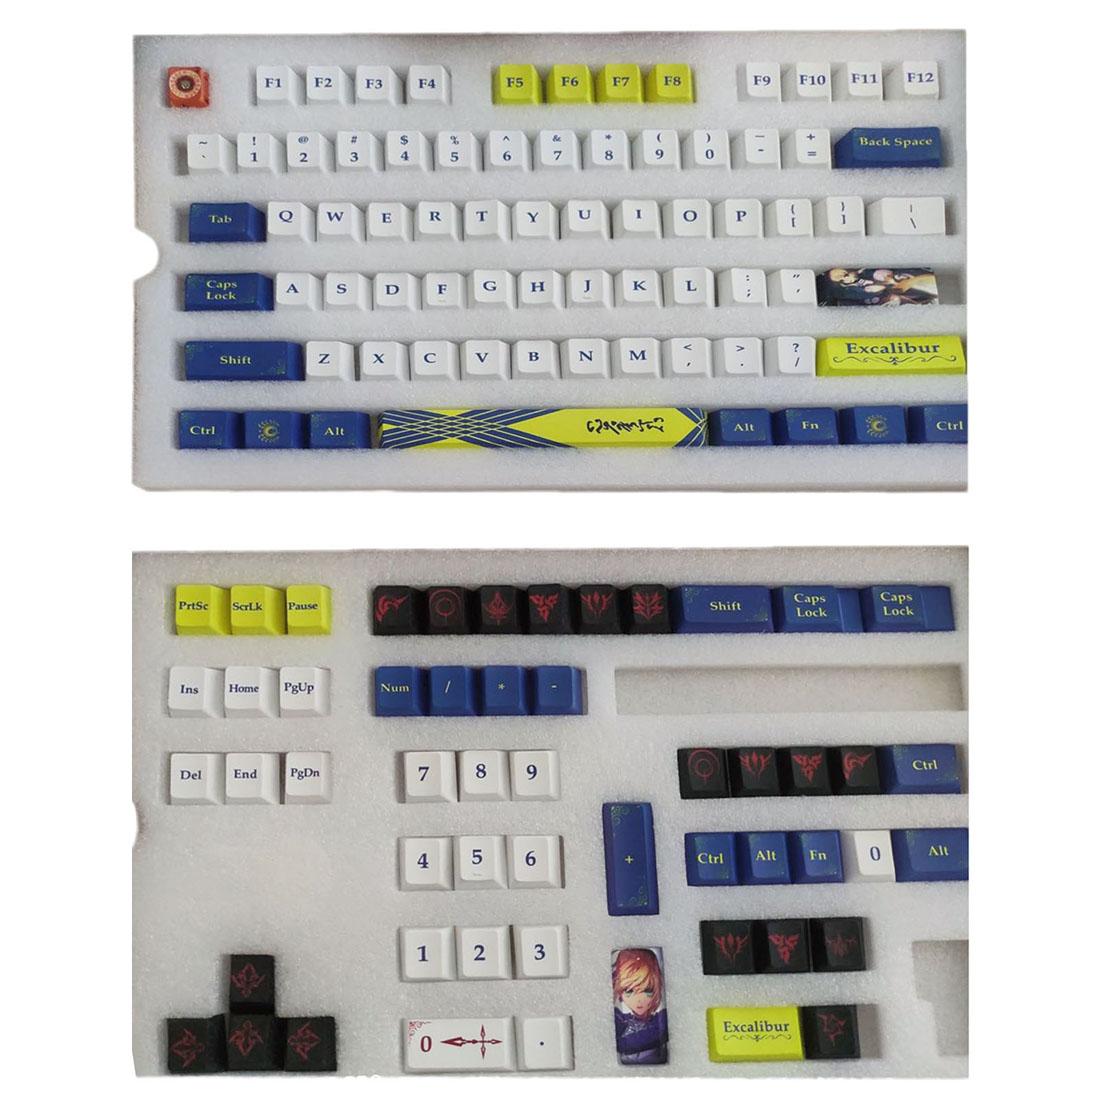 115pcs Keycaps Set Starry Sky PBT Dye-sub with Puller for 61/64/87/96/104 Keys GH60 RK61 Matrix Joke Custom Mechanical Gaming Keyboard